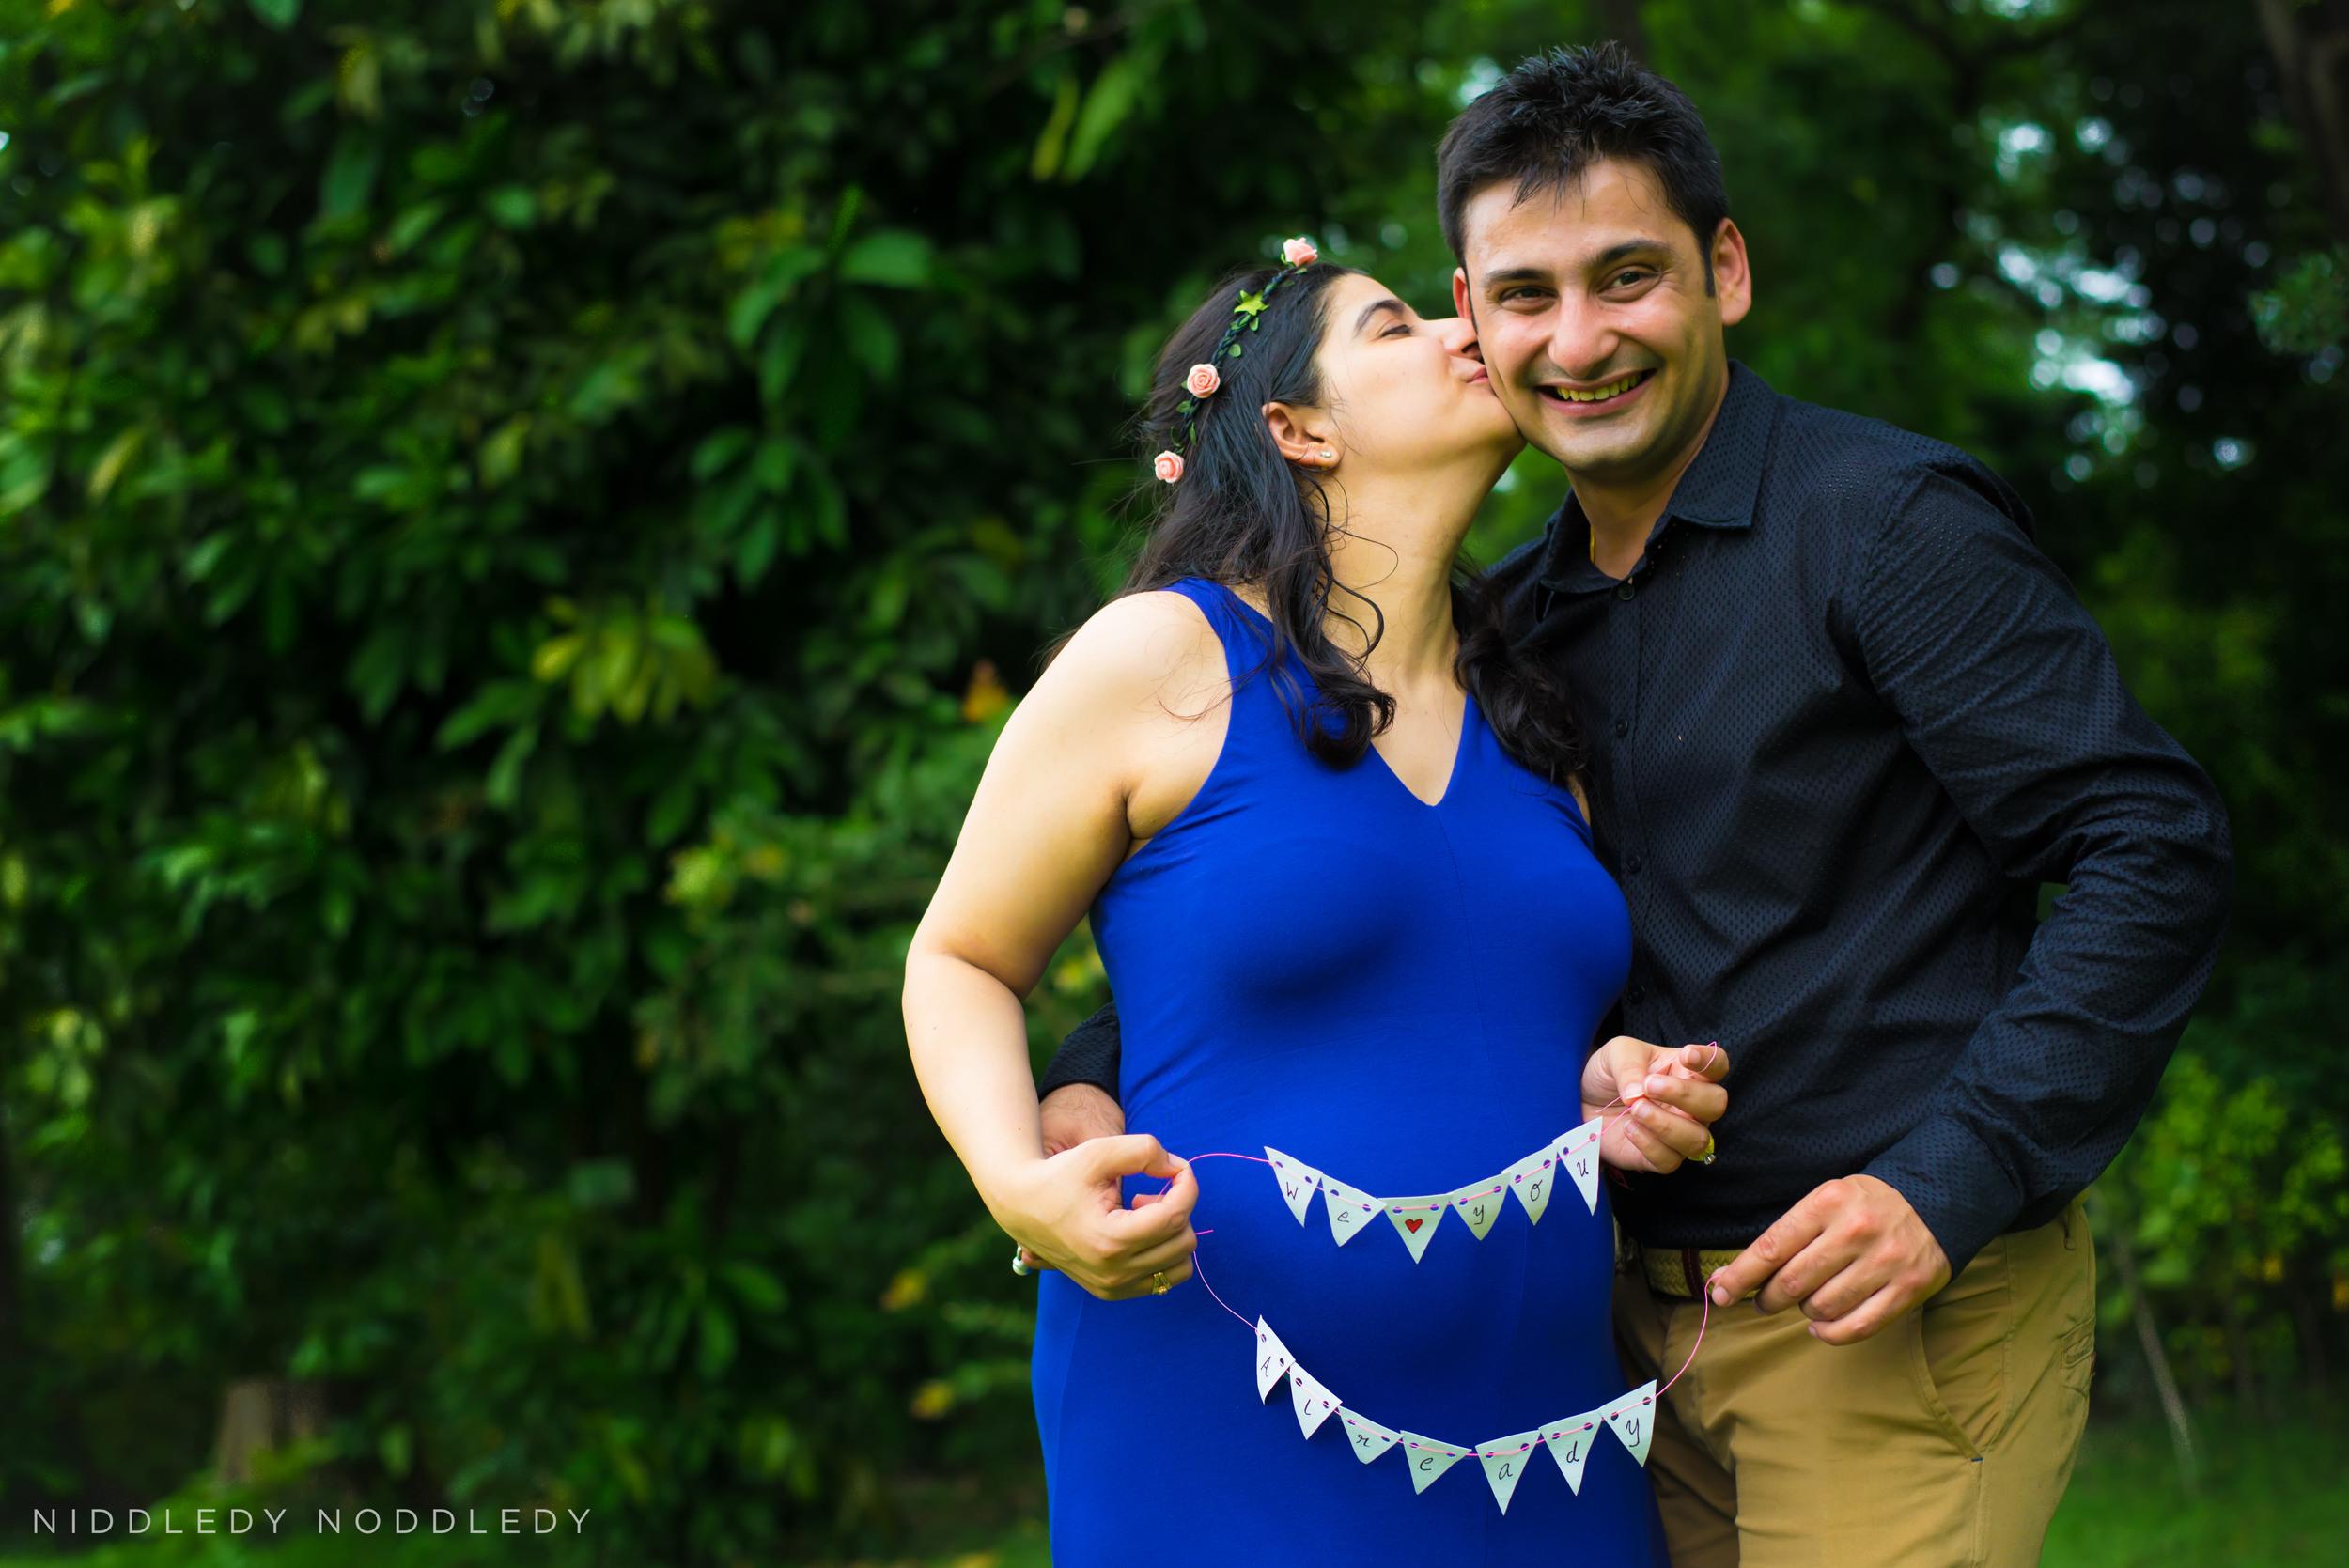 Maternity (Pregnancy:Prenatal) Photo Shoots ❤ NiddledyNoddledy.com ~ Bumps to Babies Photography, Kolkata - 09.jpg